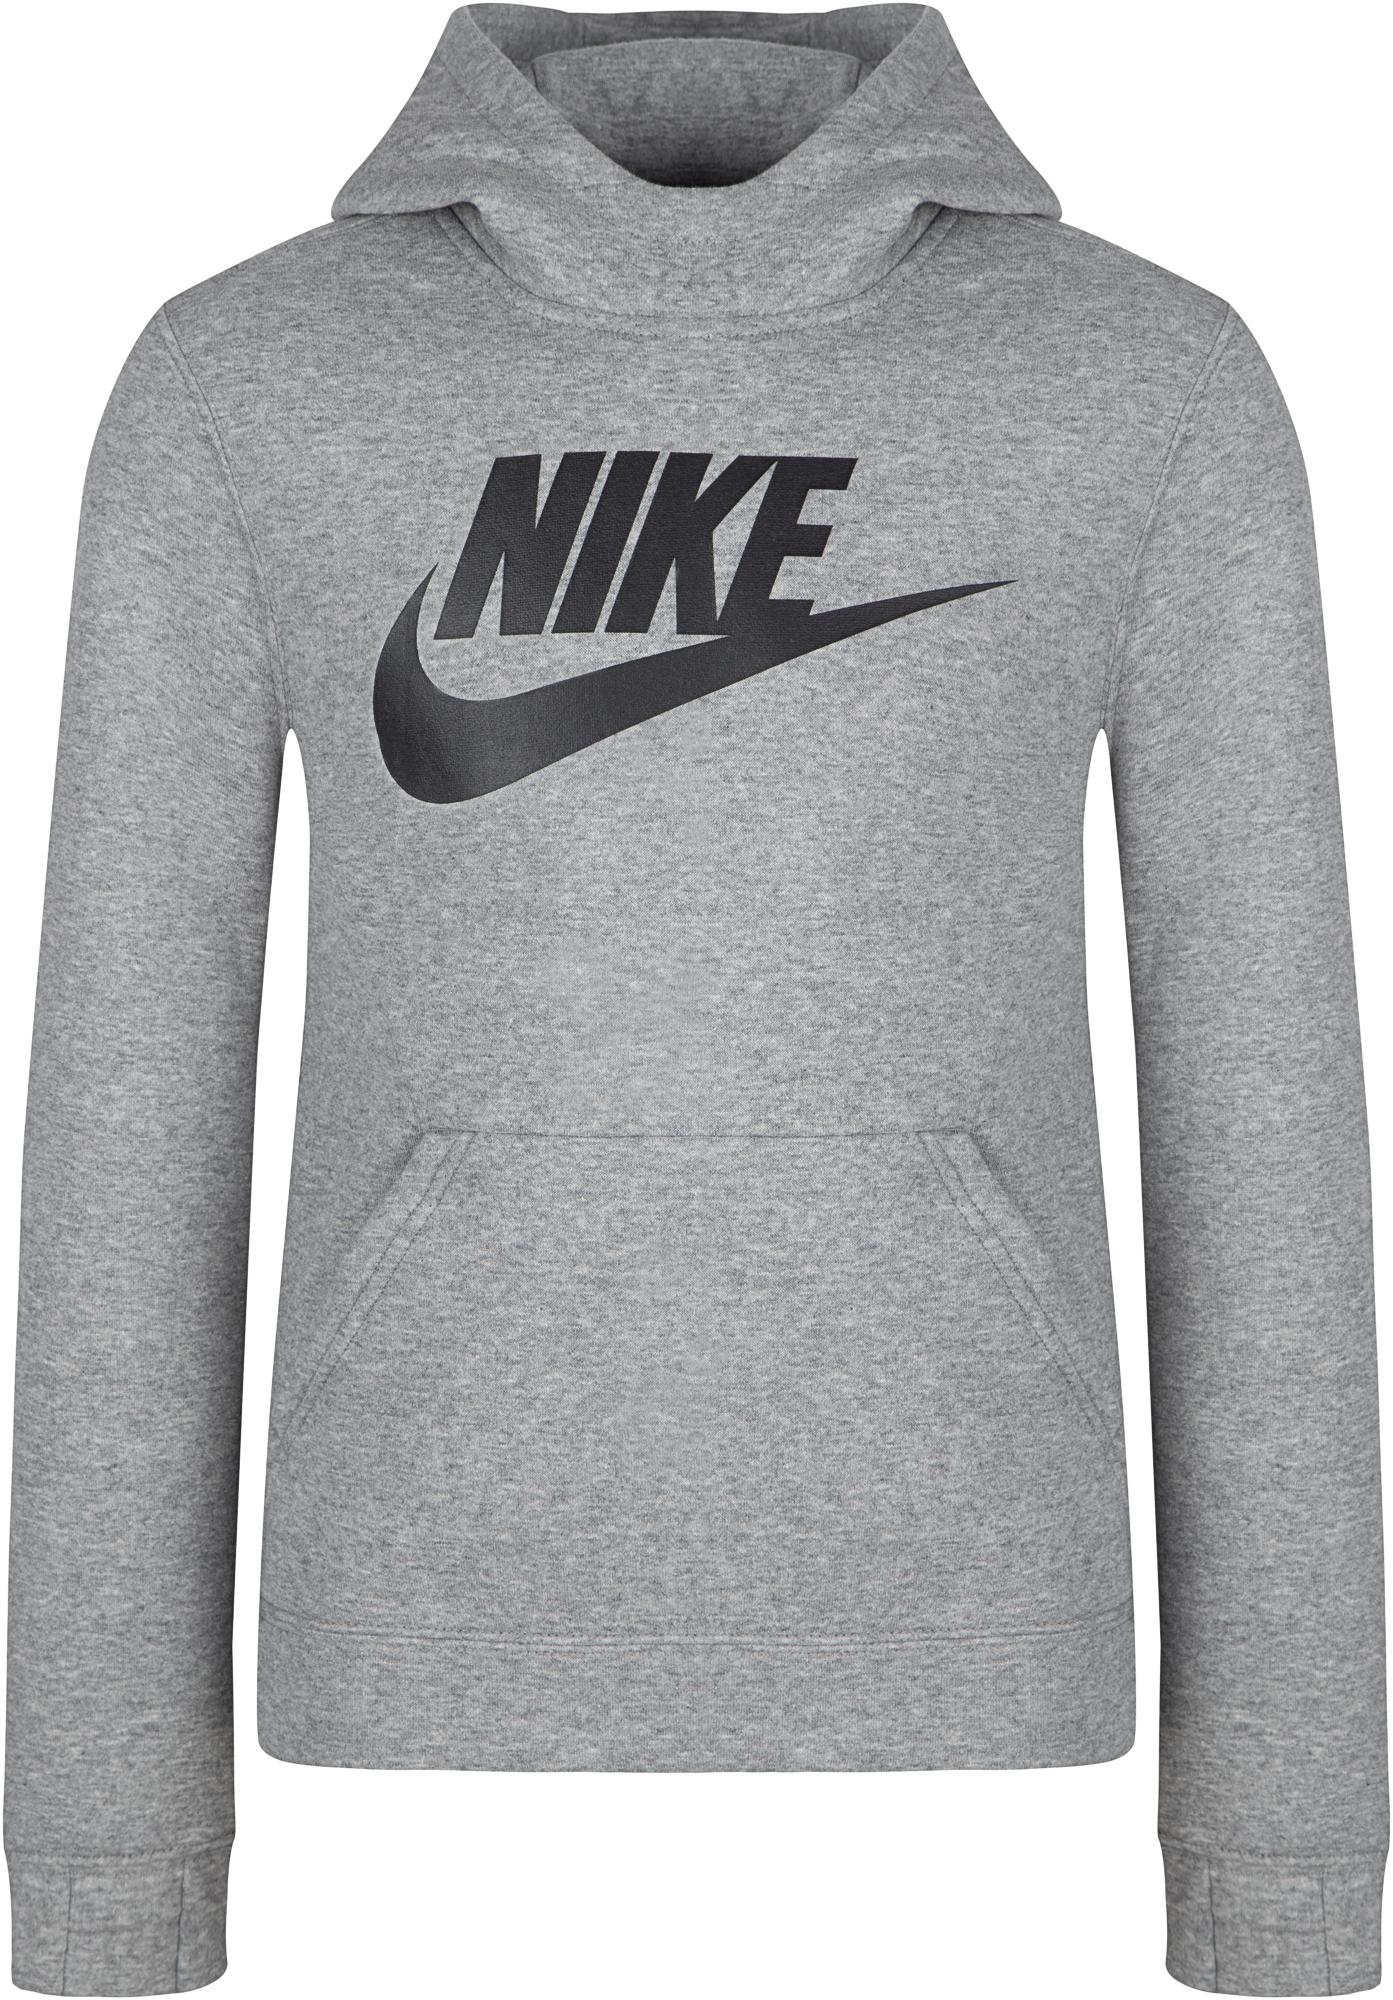 цены на Nike Худи для мальчиков Nike Sportswear, размер 158-170 в интернет-магазинах